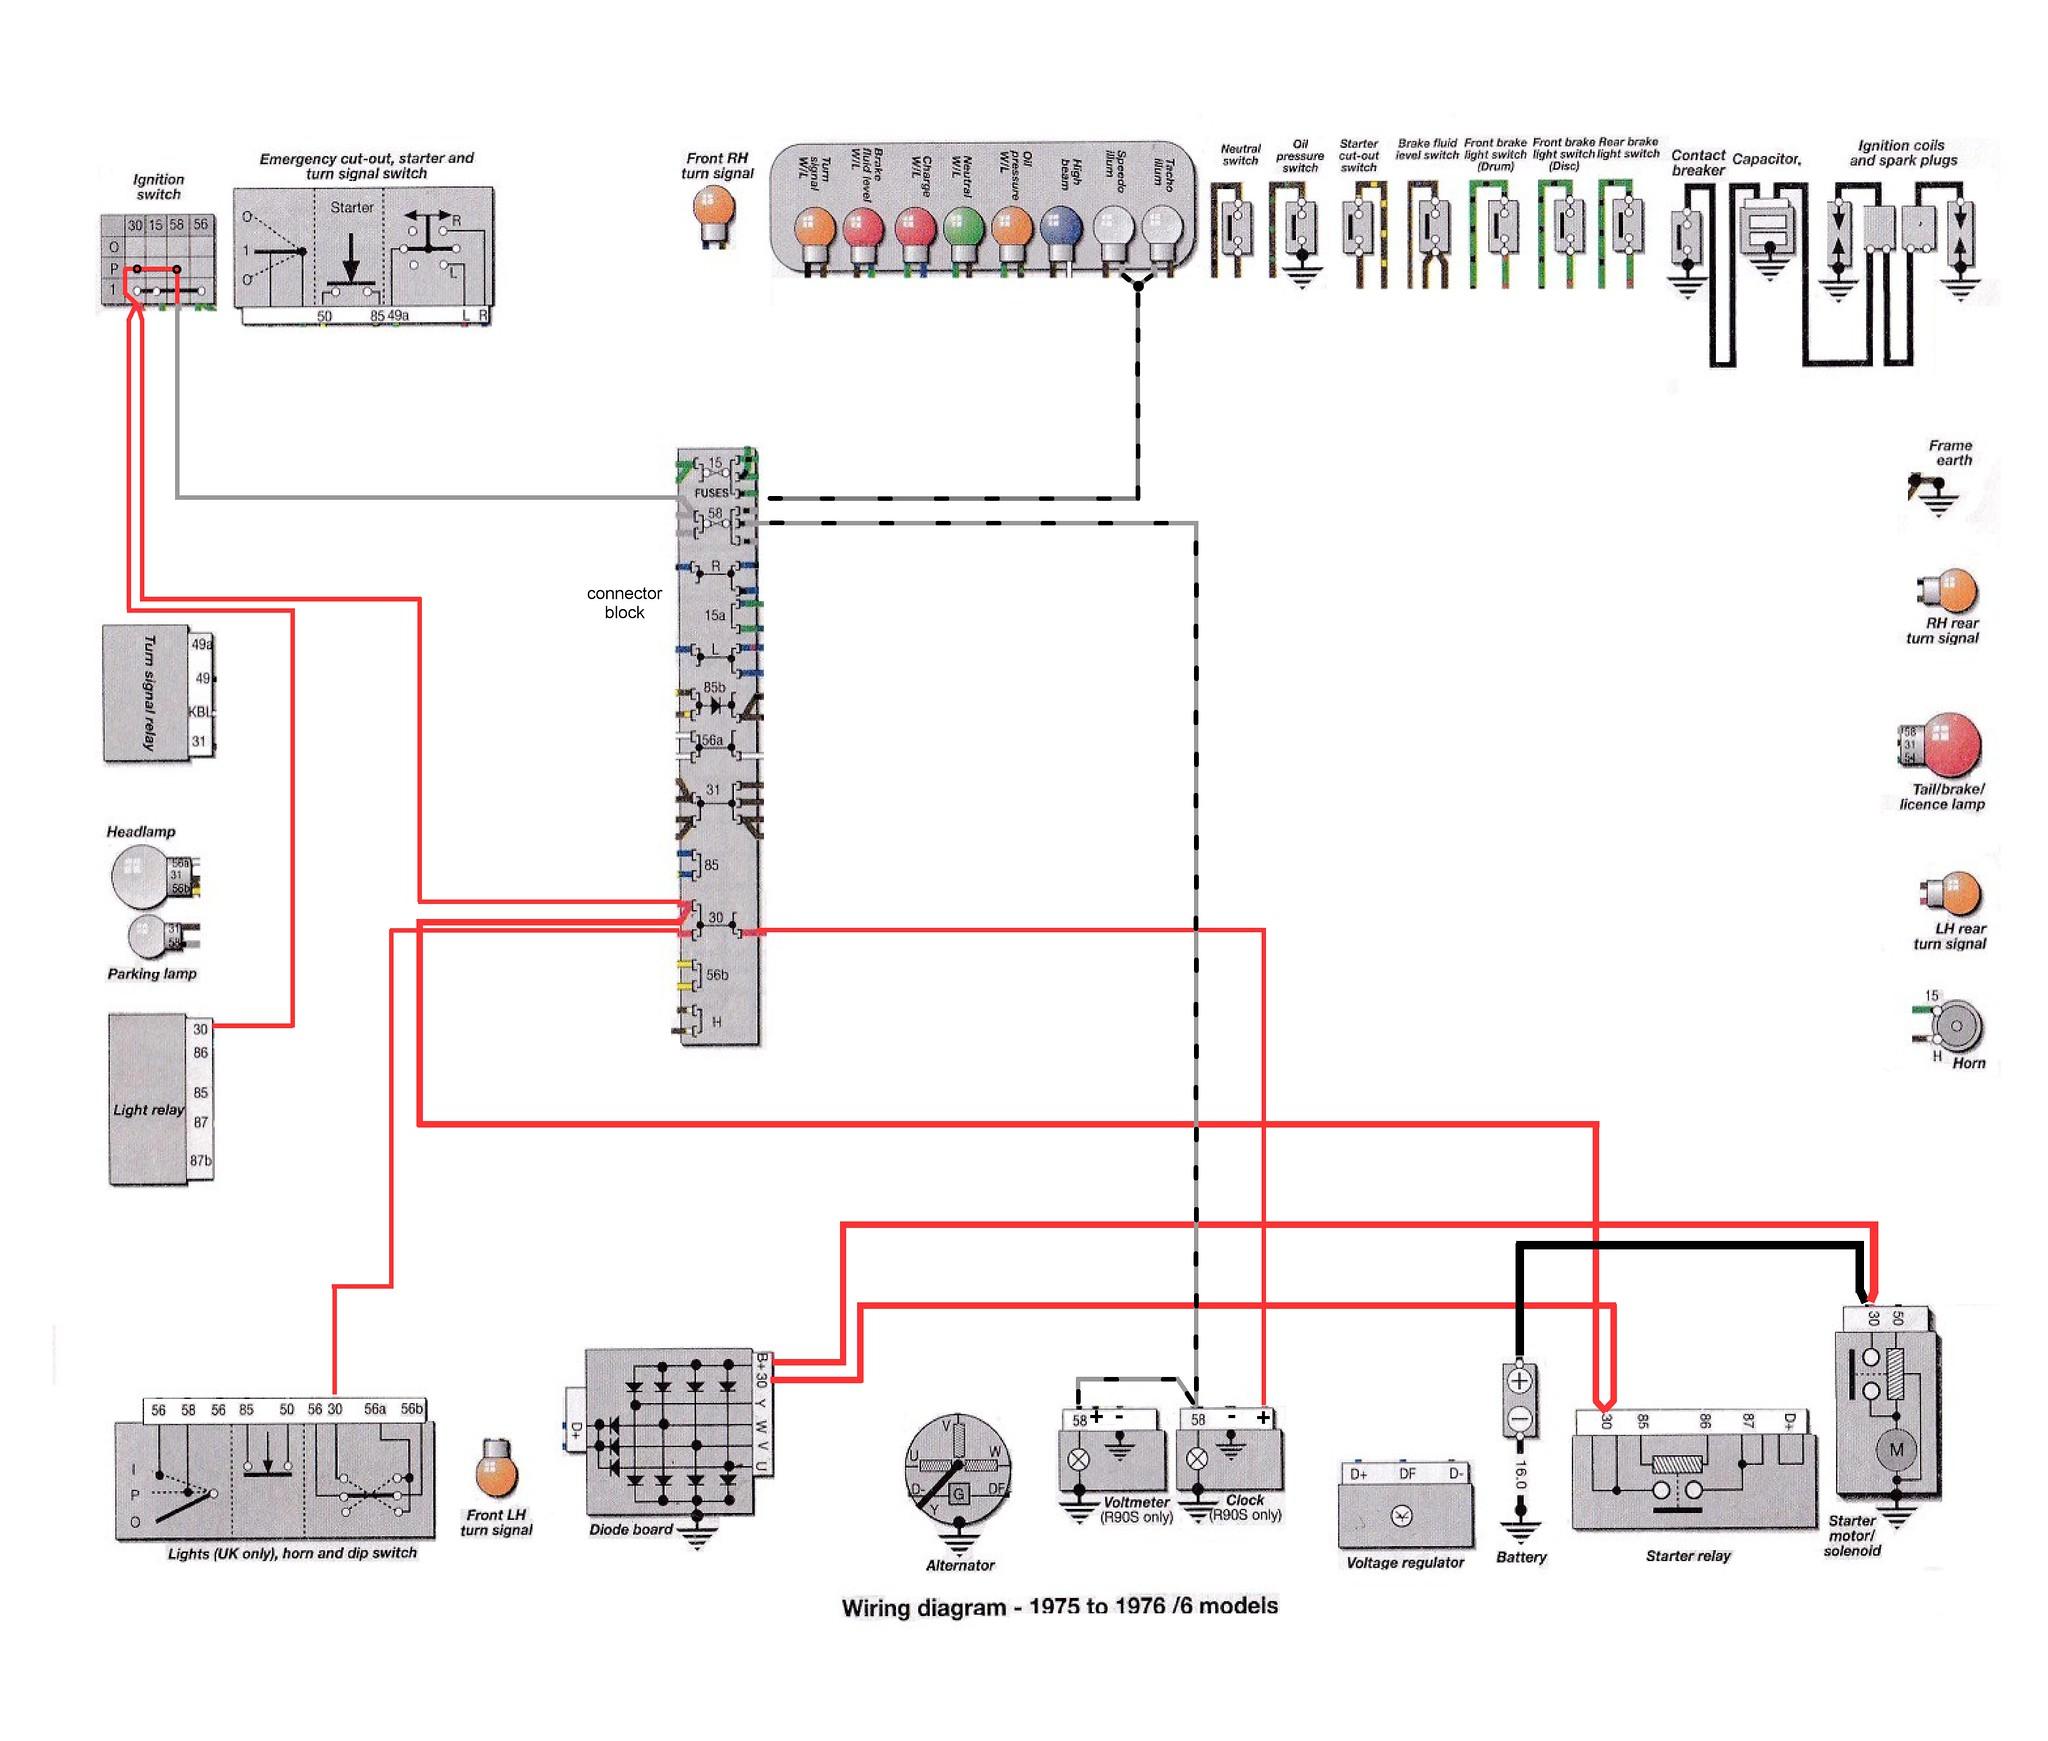 6 series, 1975 76 circuits brook\u0027s airhead garage6 series 1975 76 grey black instruments, clock, volt meter bulbs